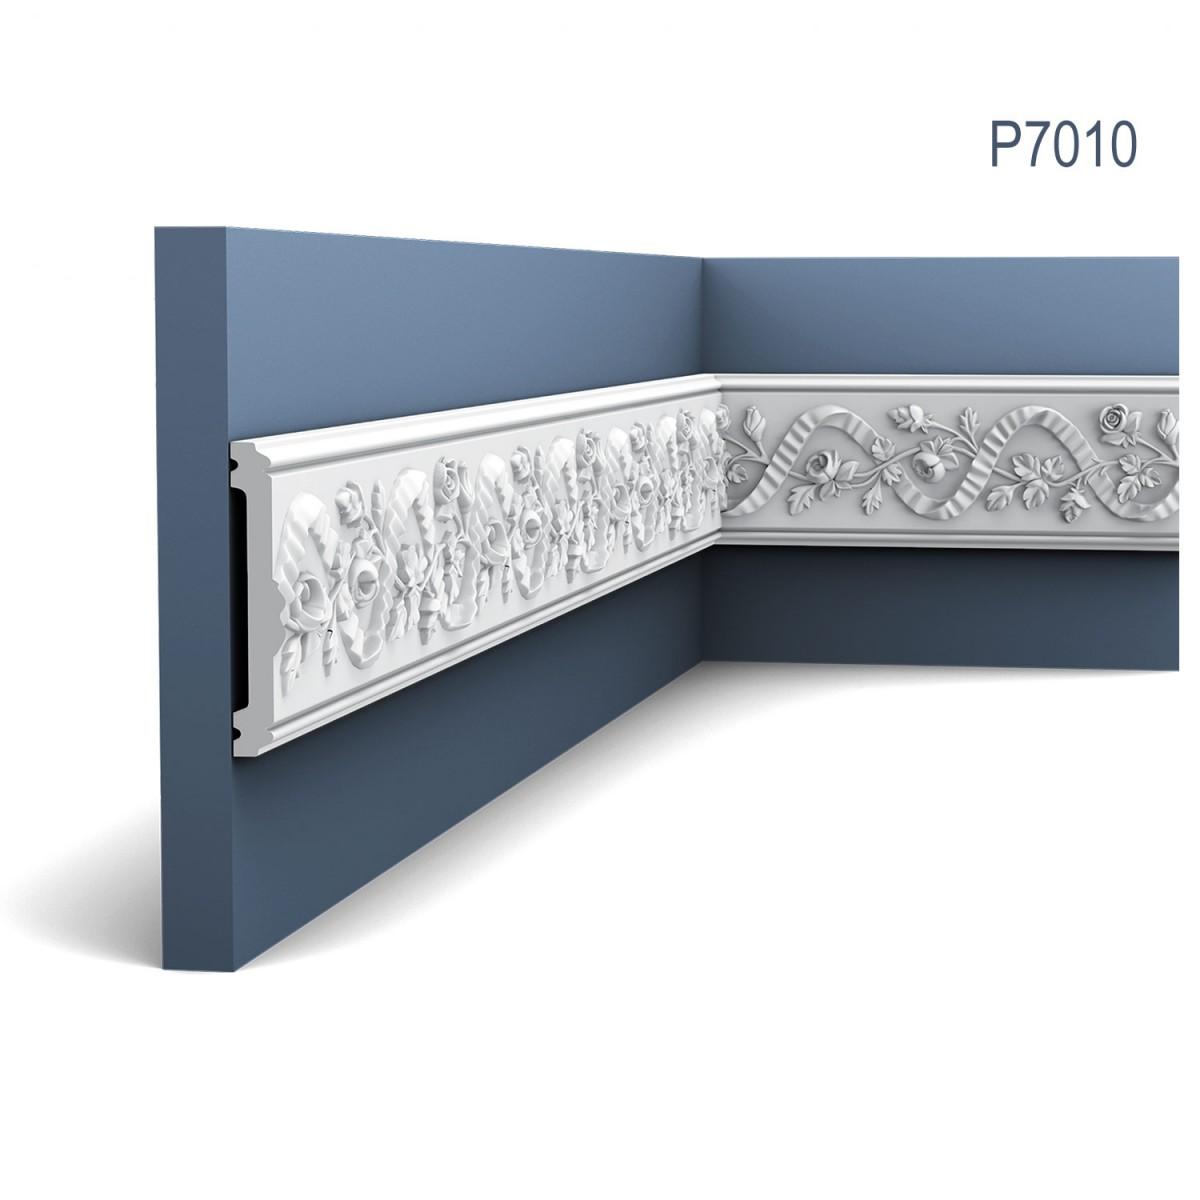 Brau Luxxus P7010, Dimensiuni: 200 X 10.5 X 2 cm, Orac Decor